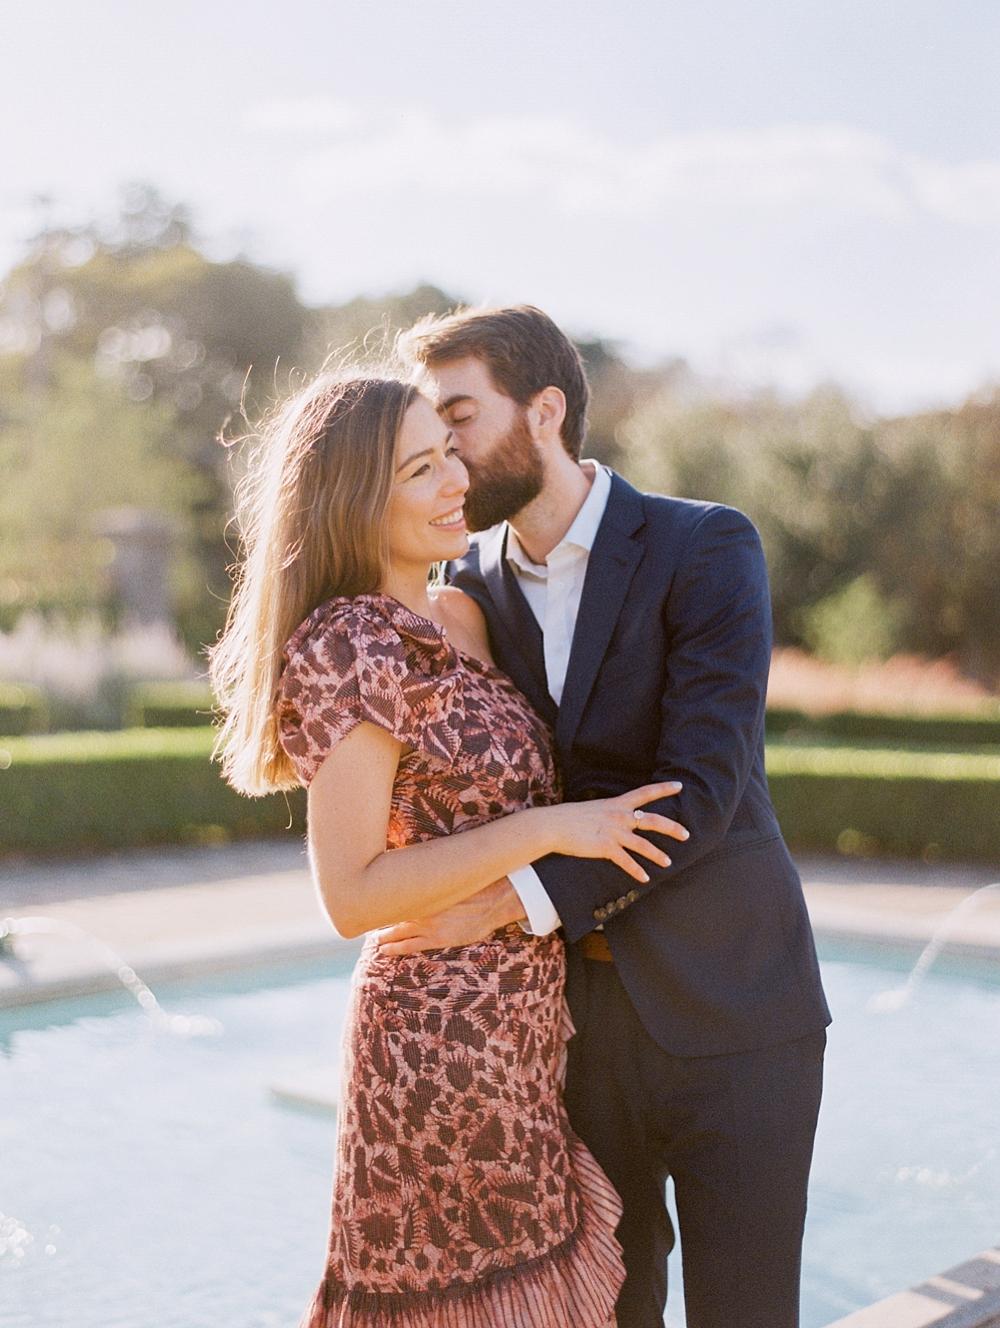 kristin-la-voie-photography-Austin-Wedding-Photographer-laguna-gloria-commodore-perry-estate-engagement-113